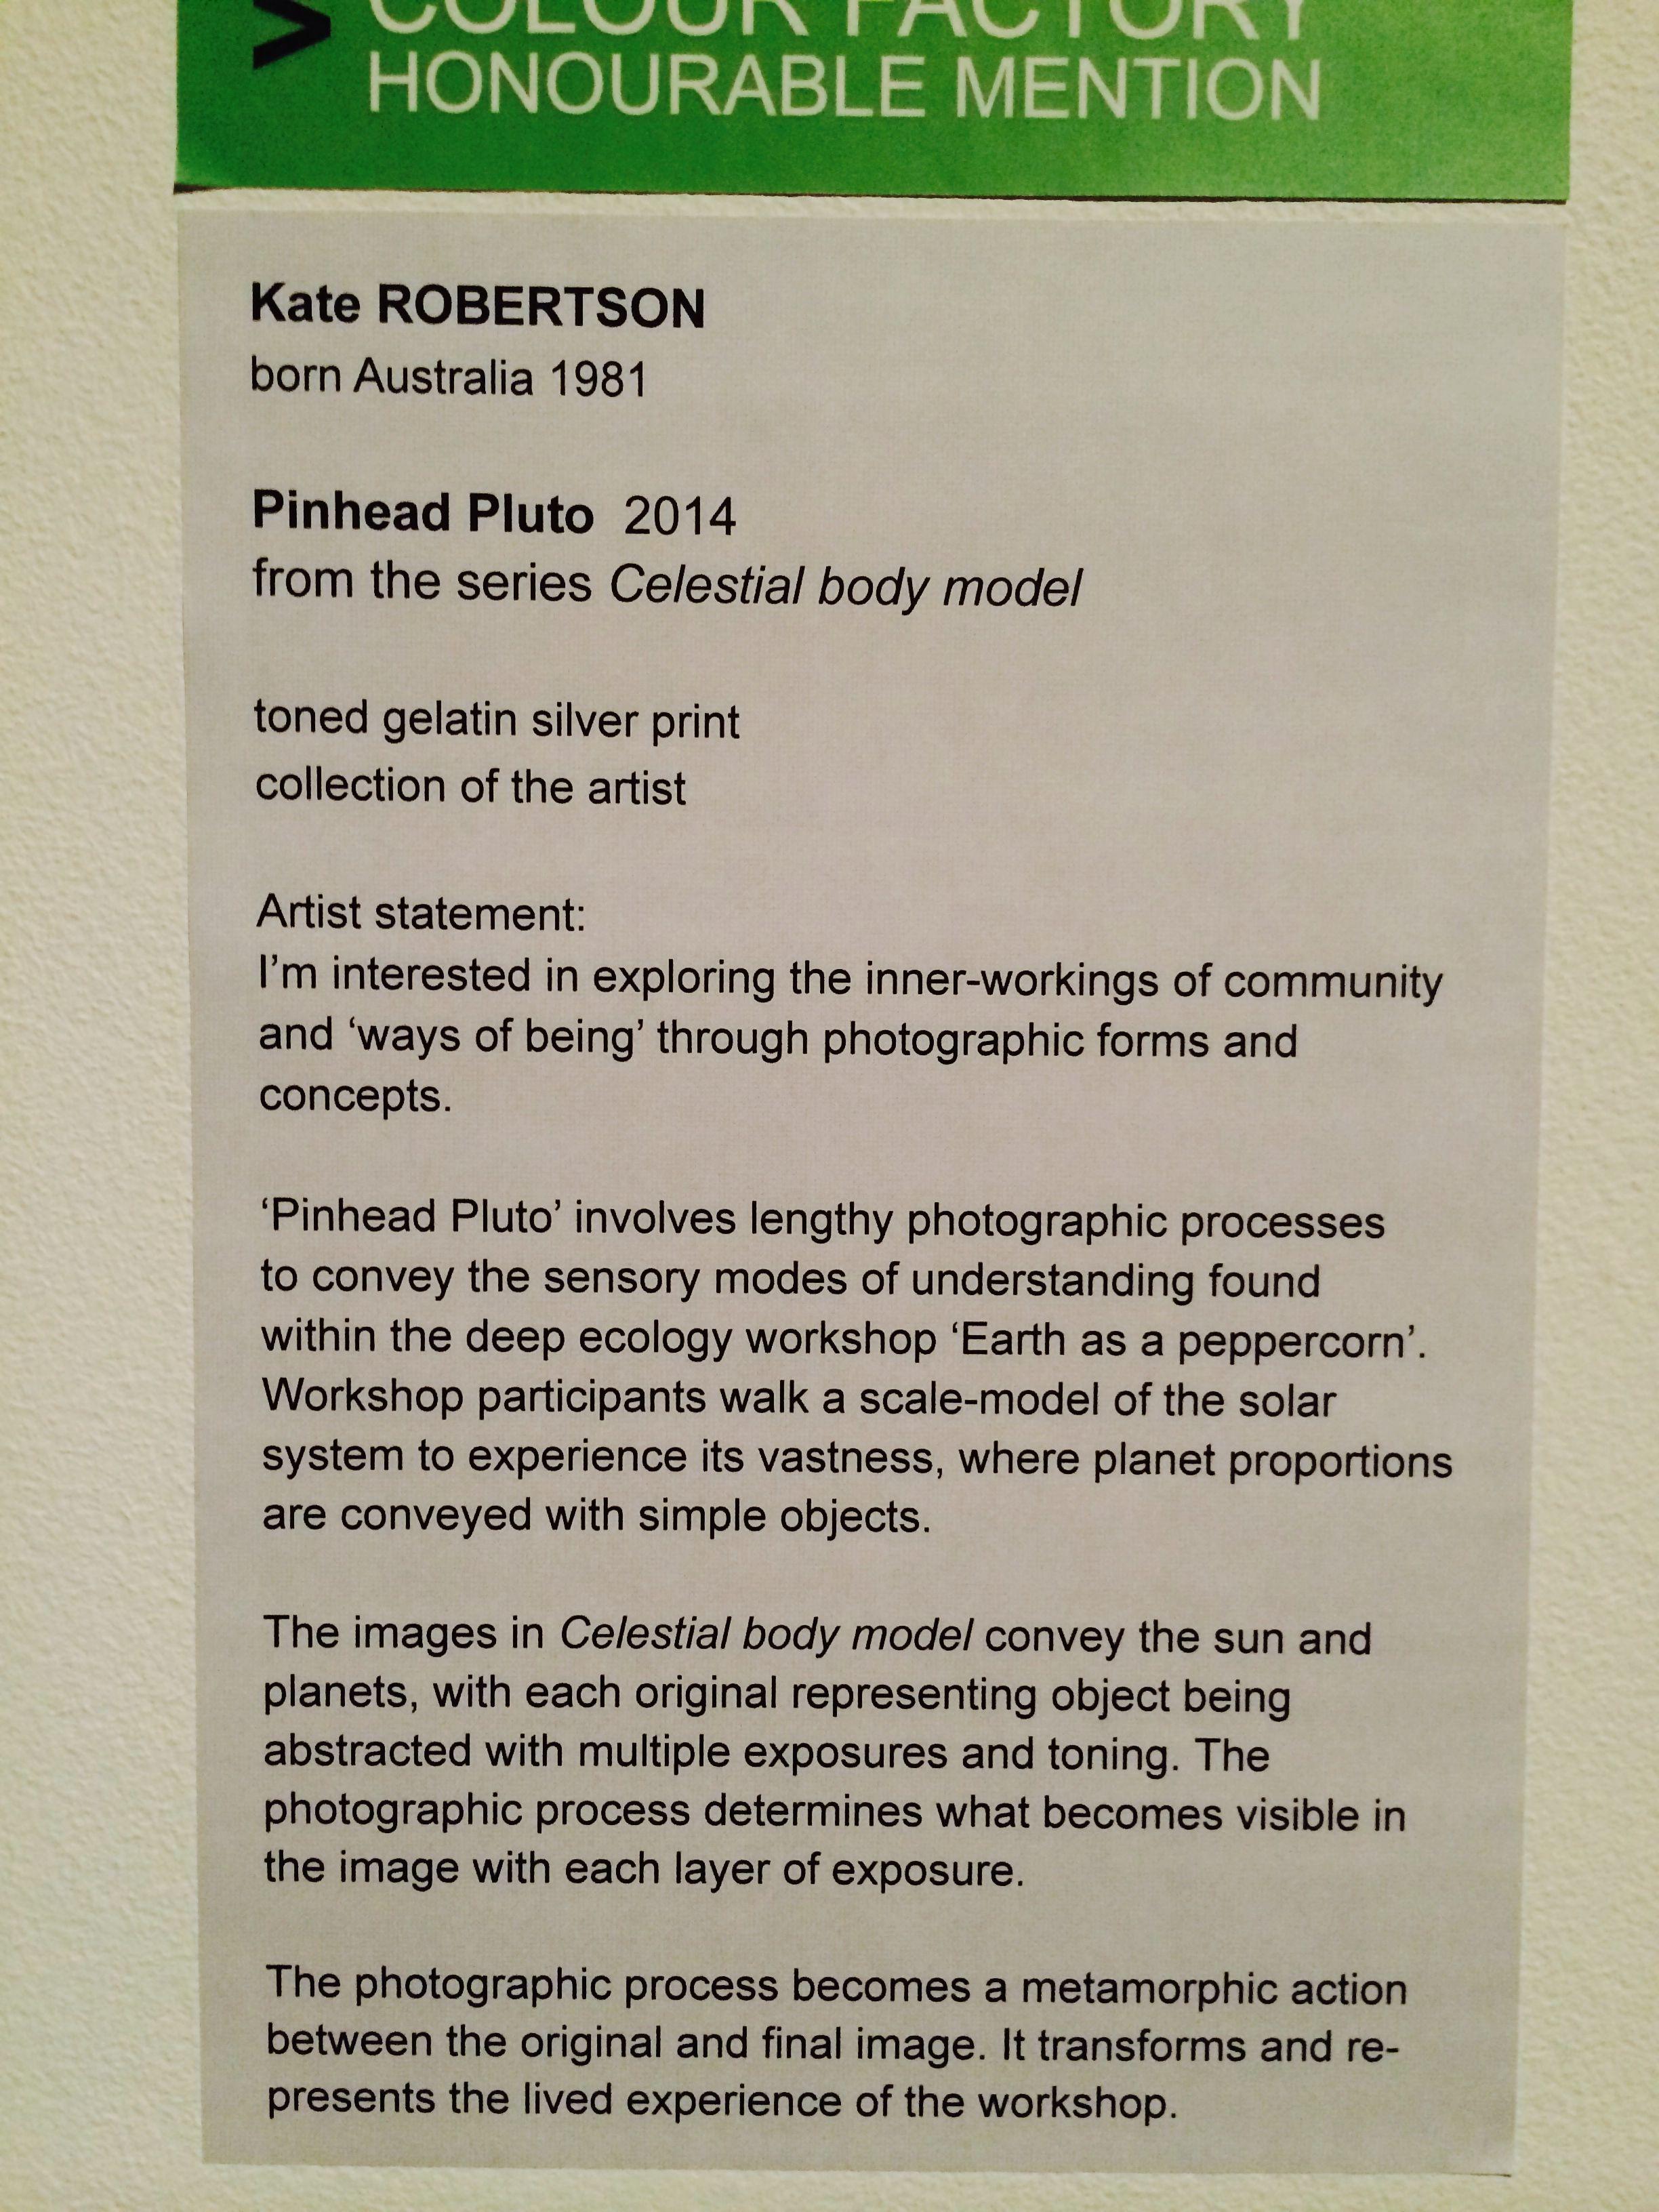 Kate ROBERTSON, Pinhead Pluto 2014, toned gelatin silver print.